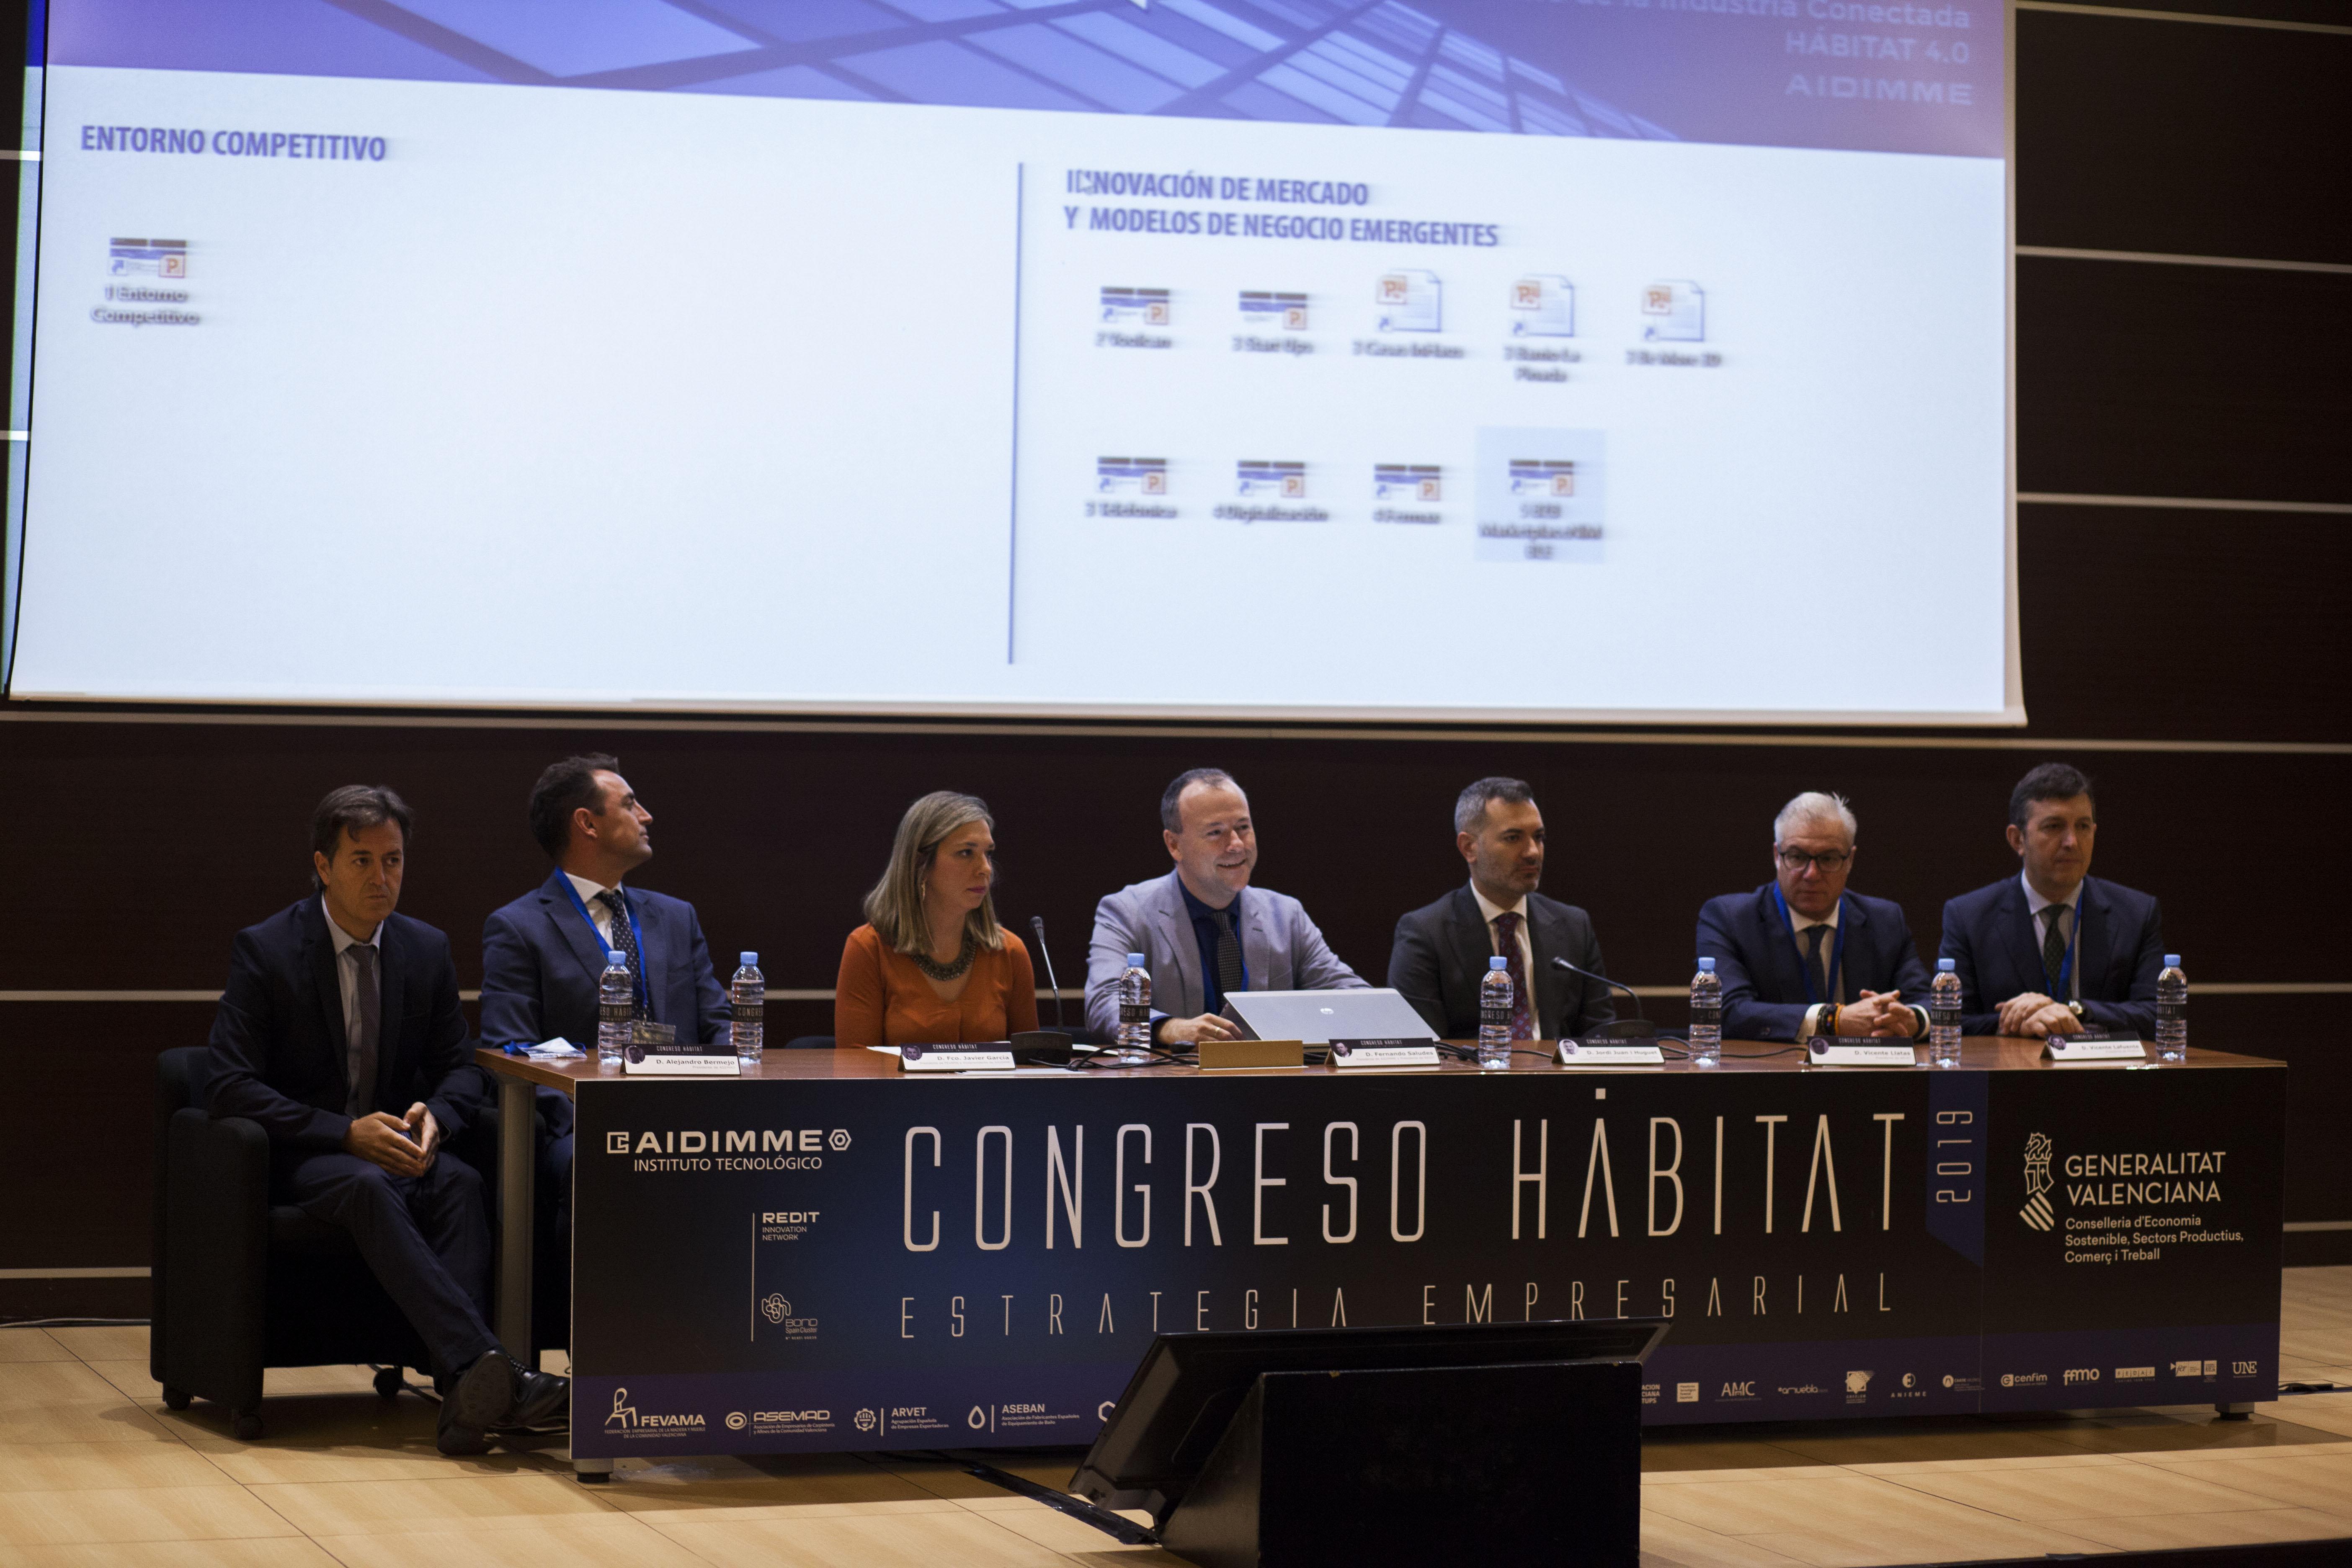 CONGRESO-HABITAT-154